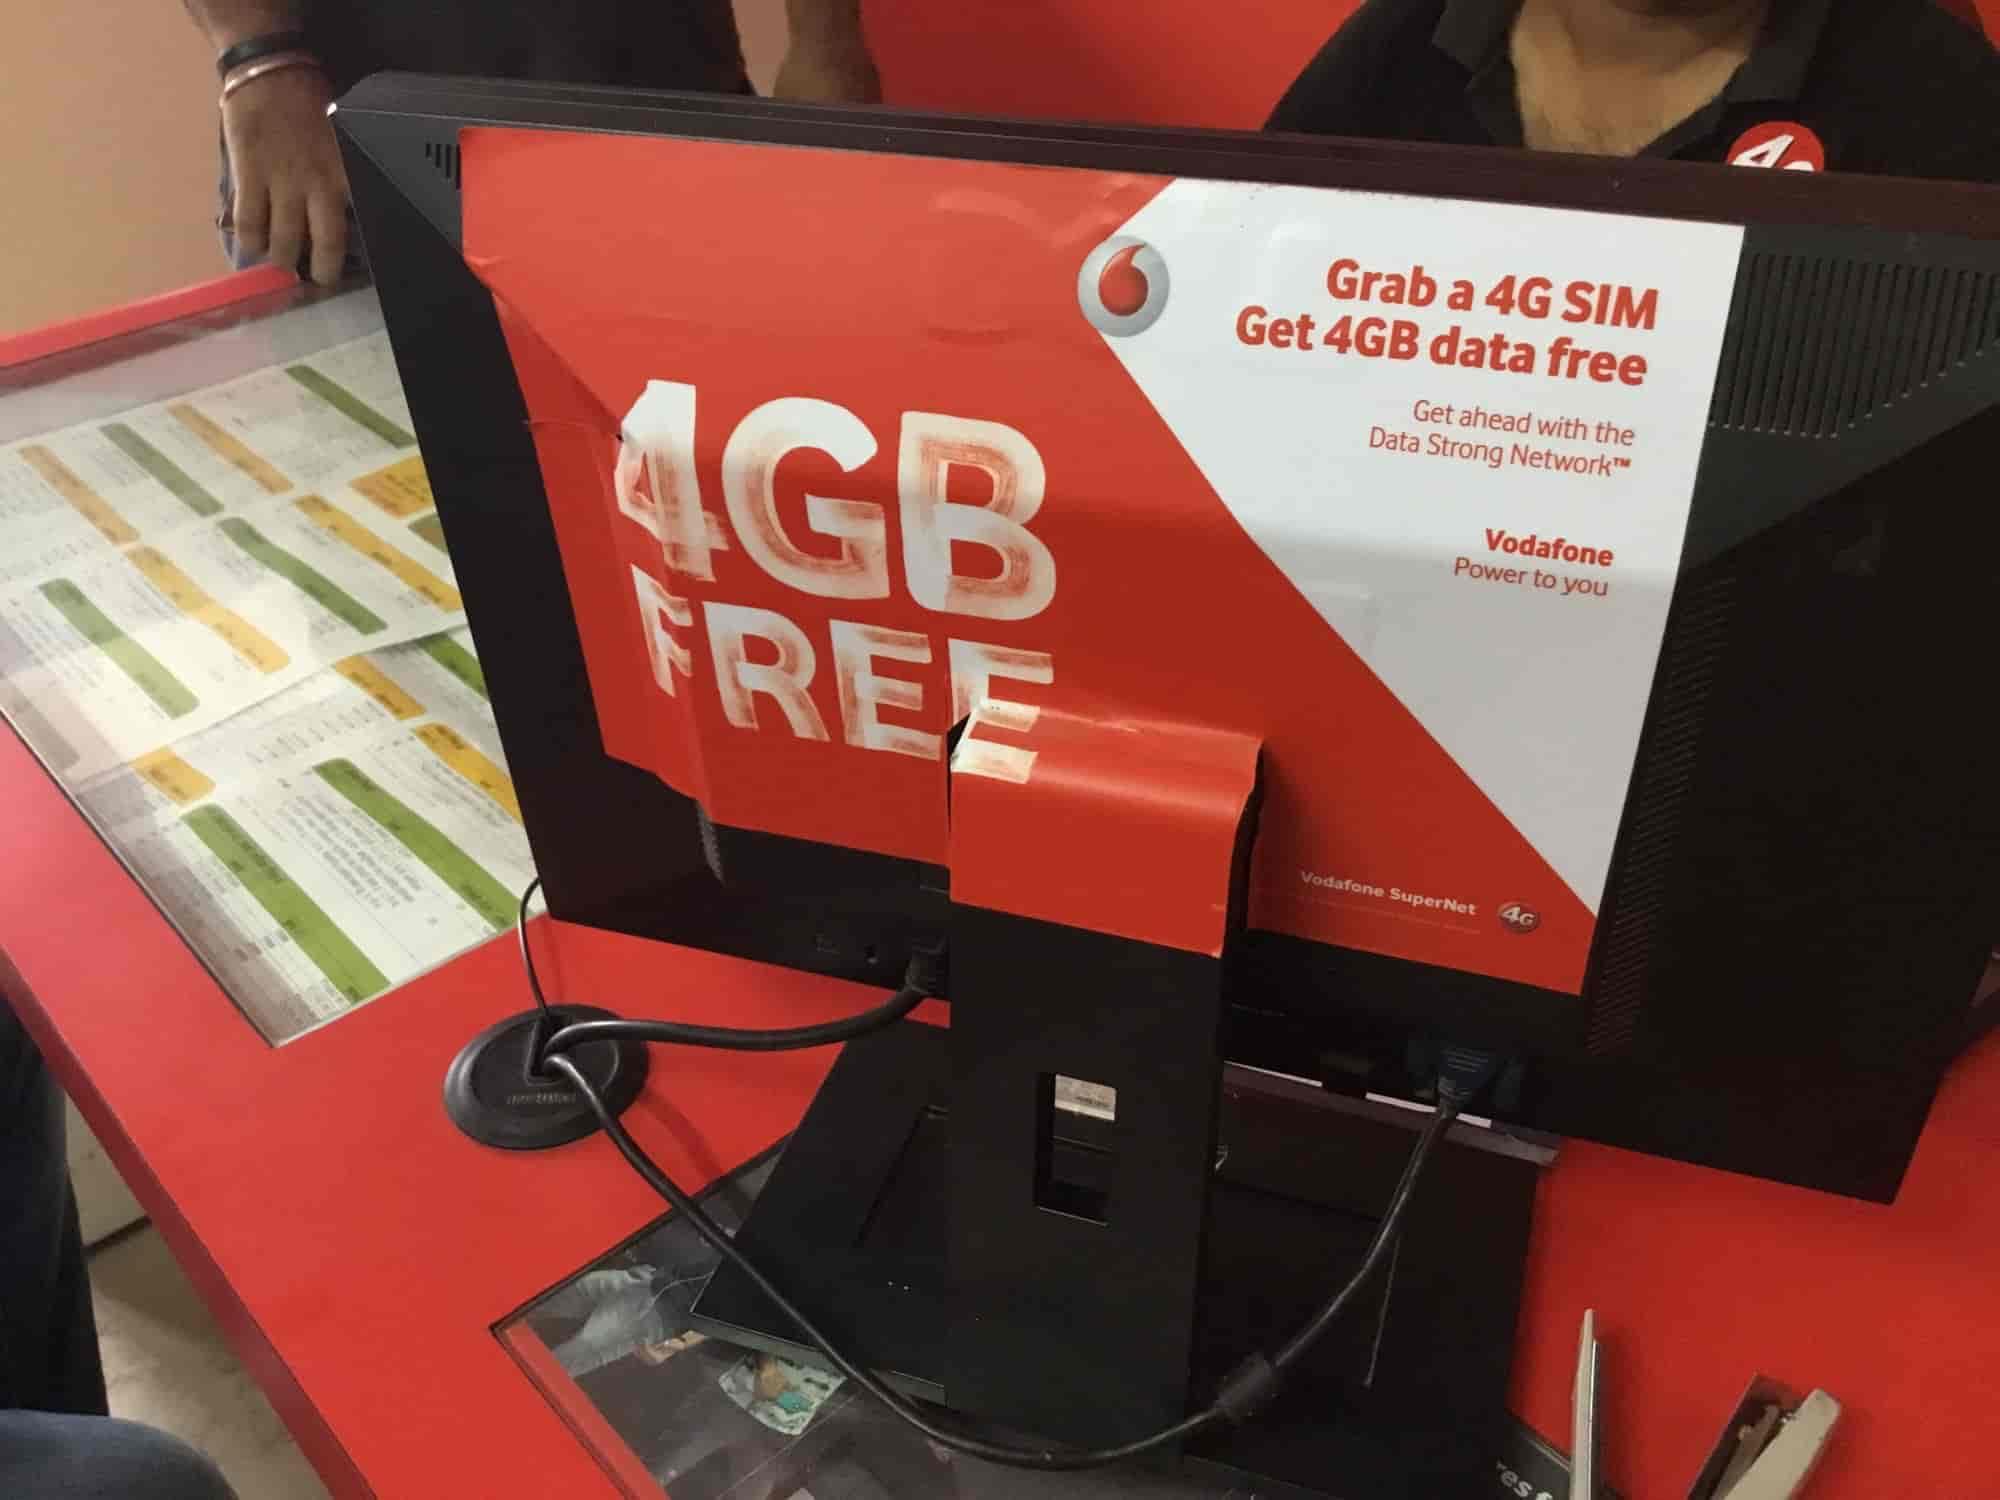 Vodafone Mini Store, Zirakpur HO - Postpaid Mobile Phone